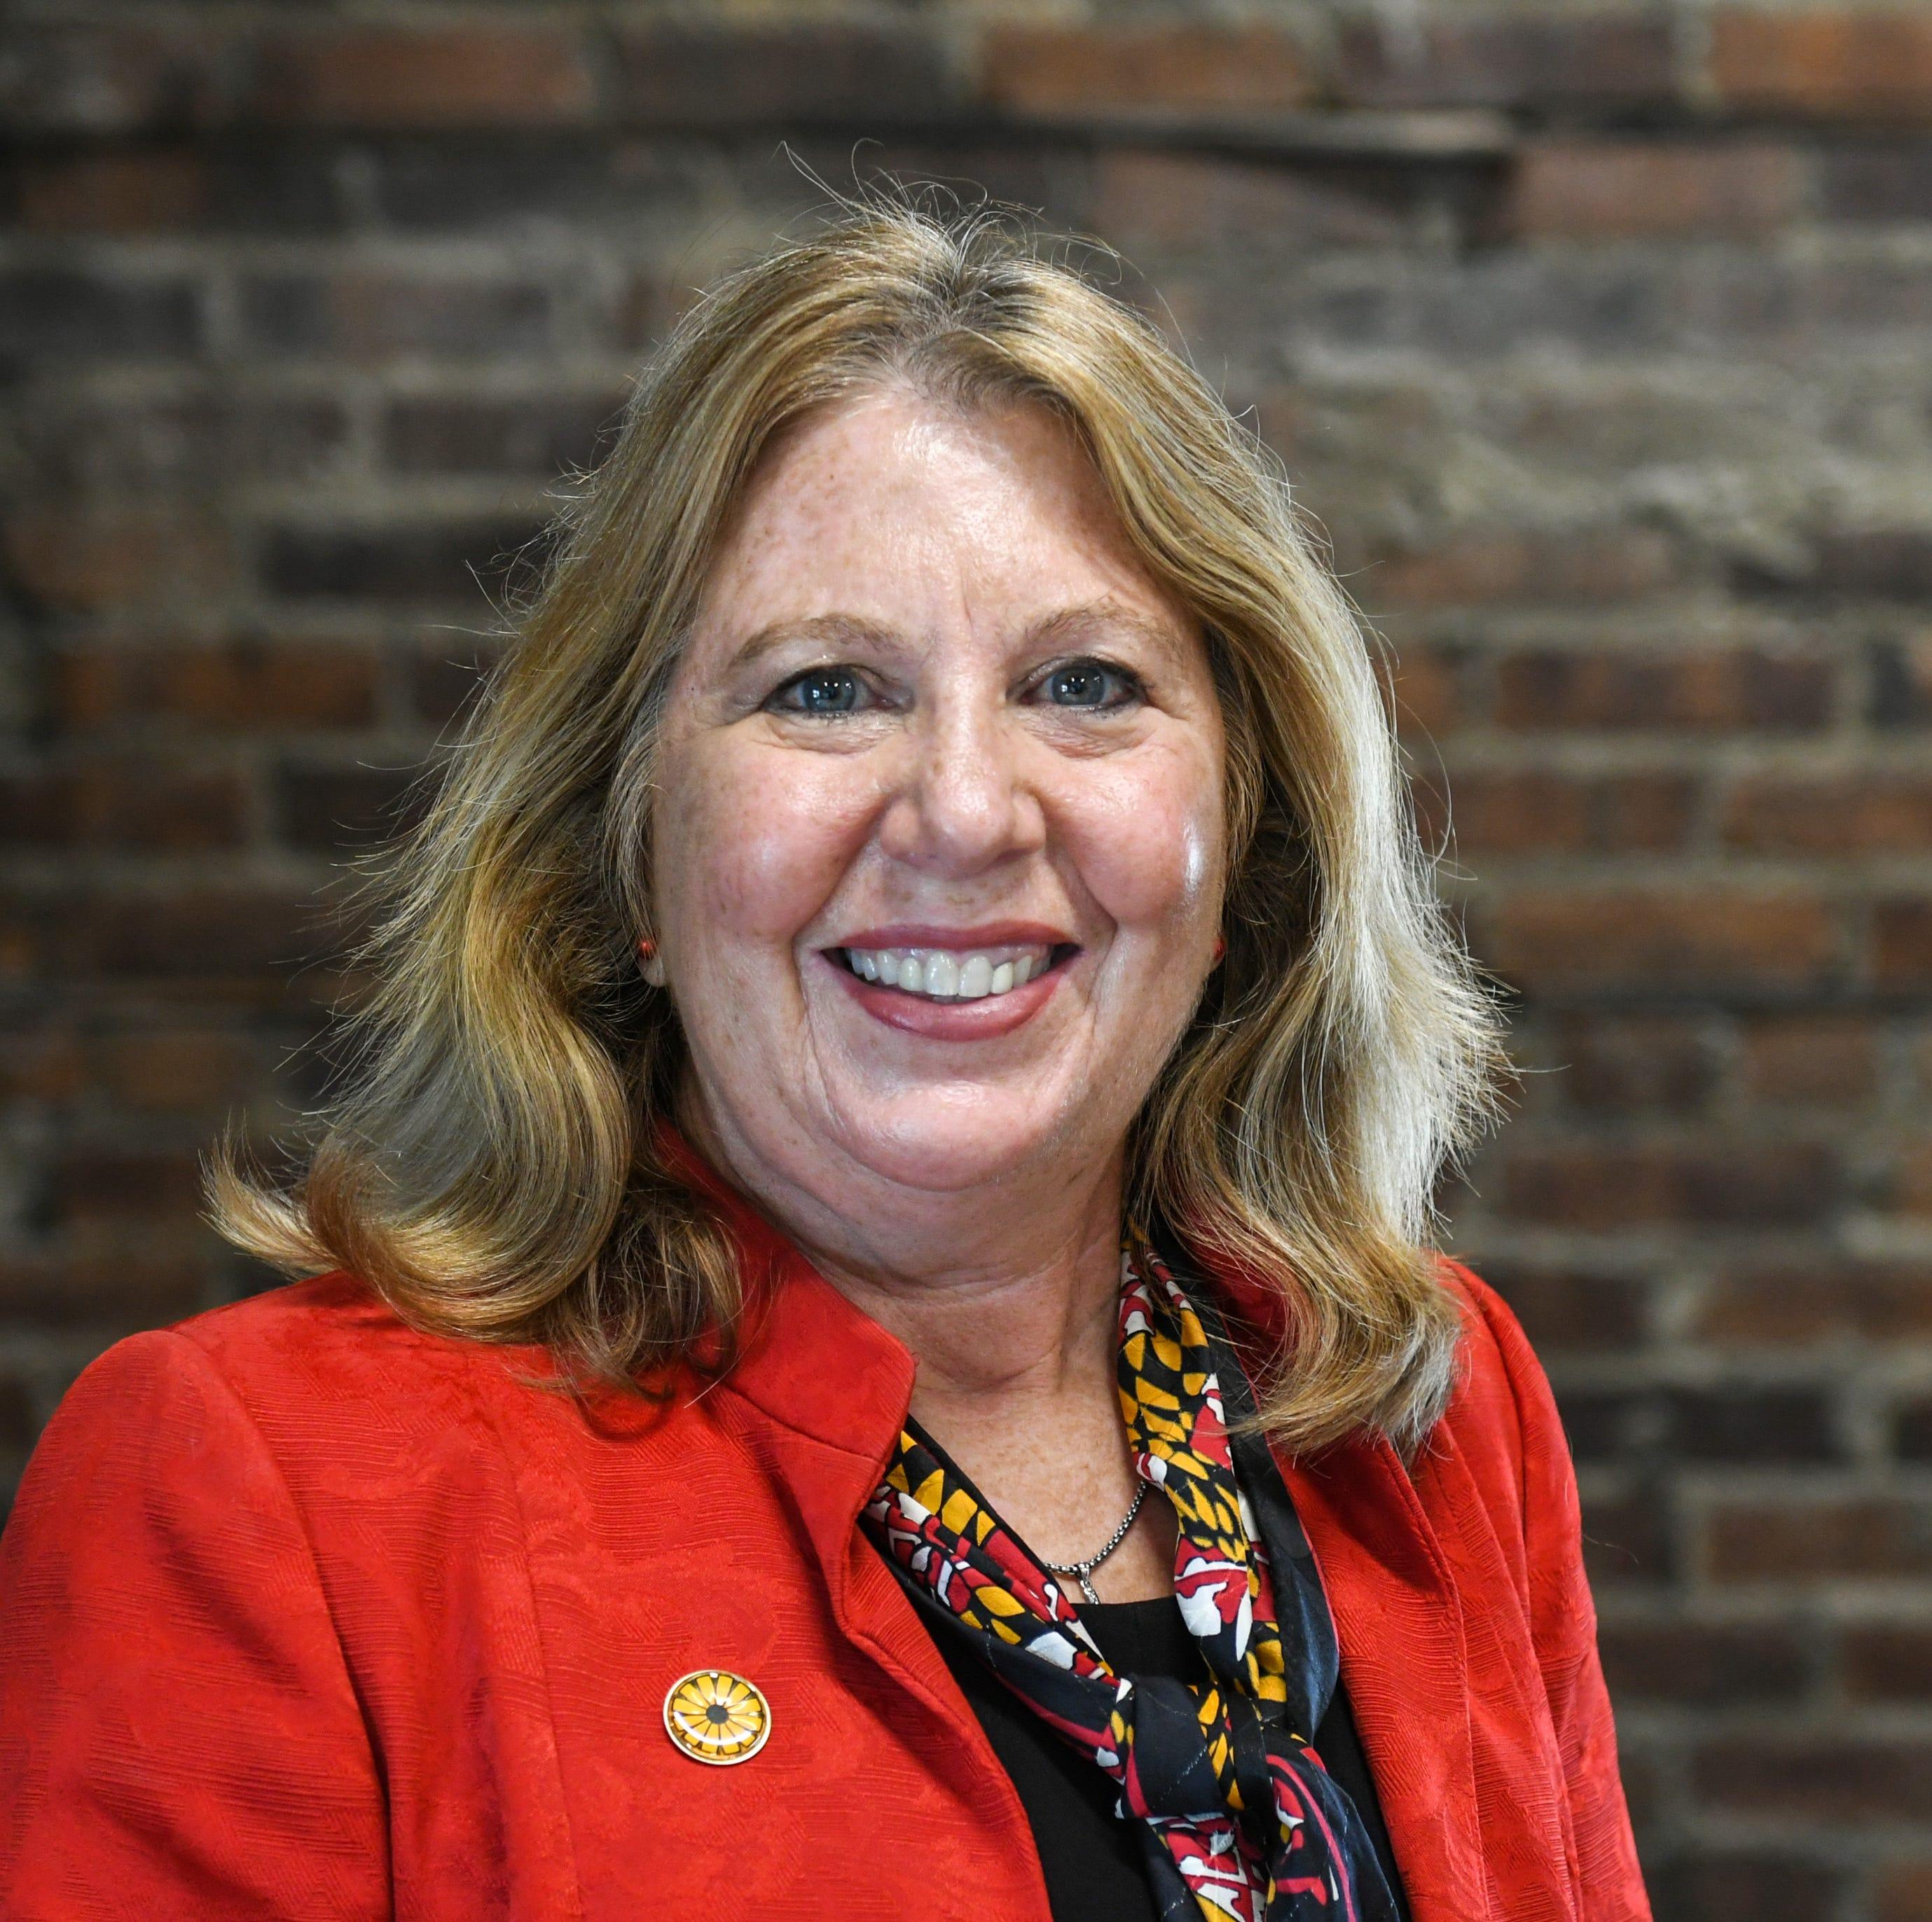 We need Mary Beth Carozza's fresh ideas, leadership: Opposing view